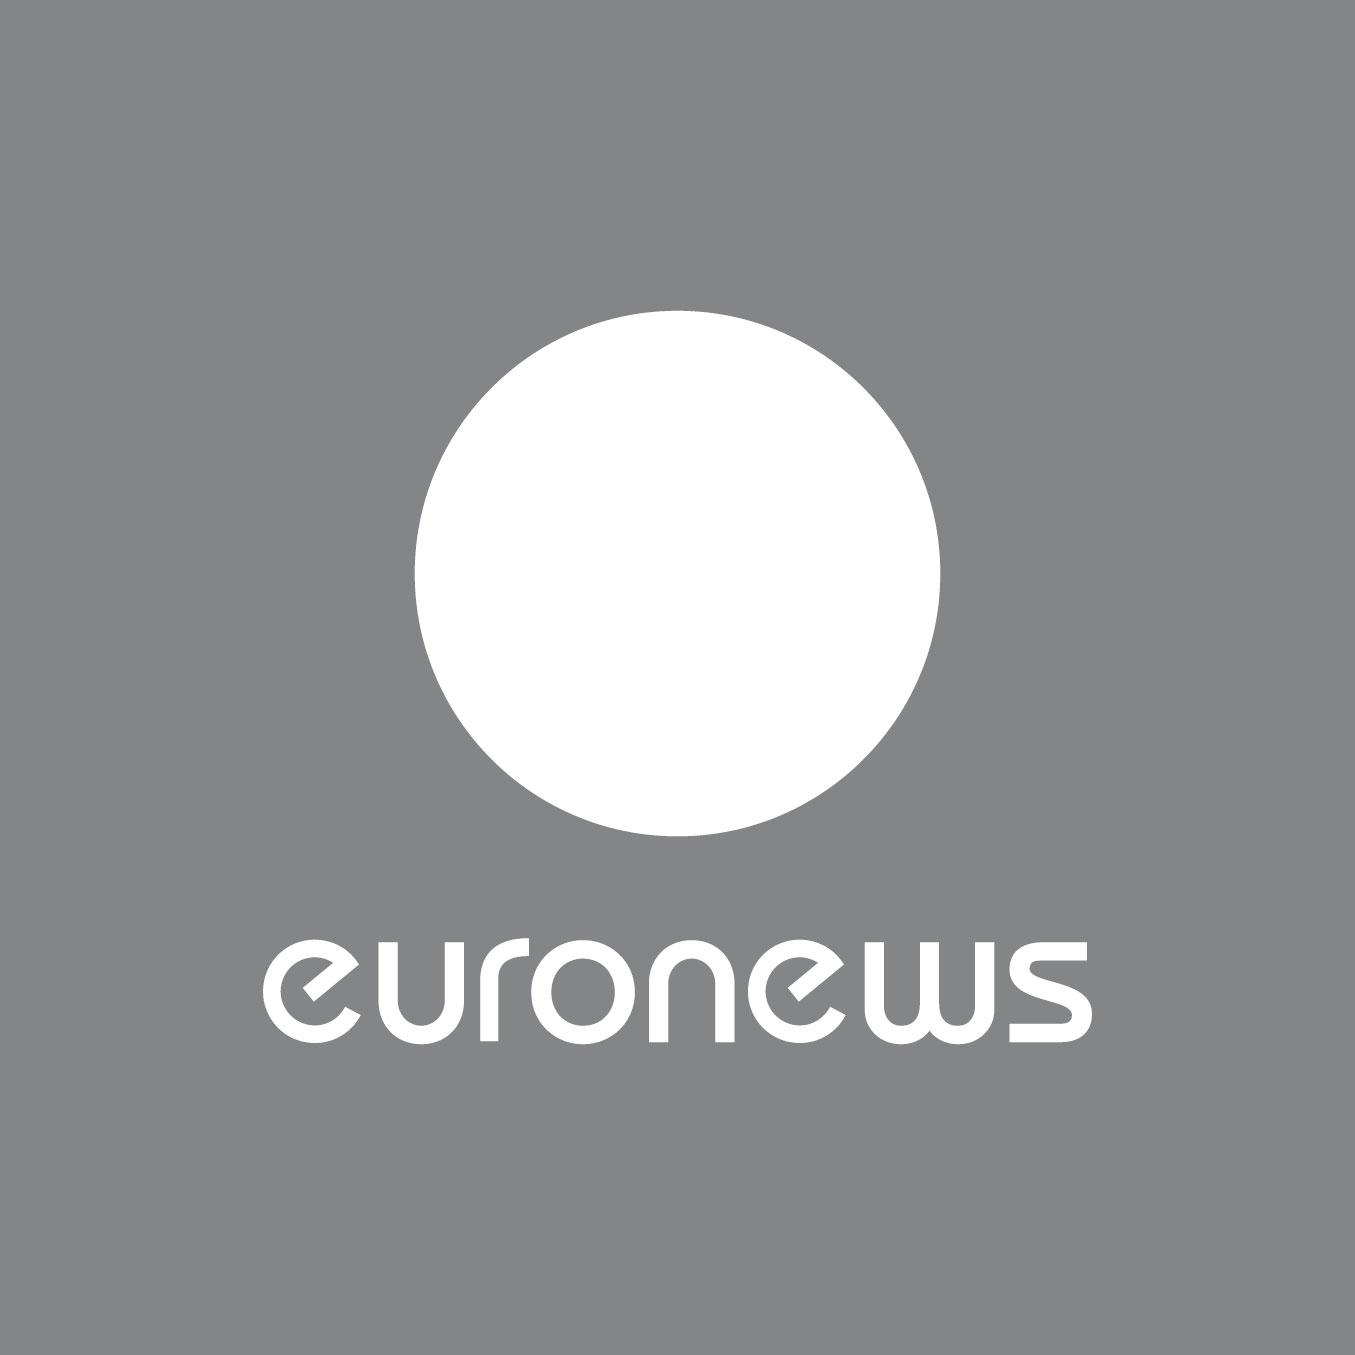 euronews-logo.jpg